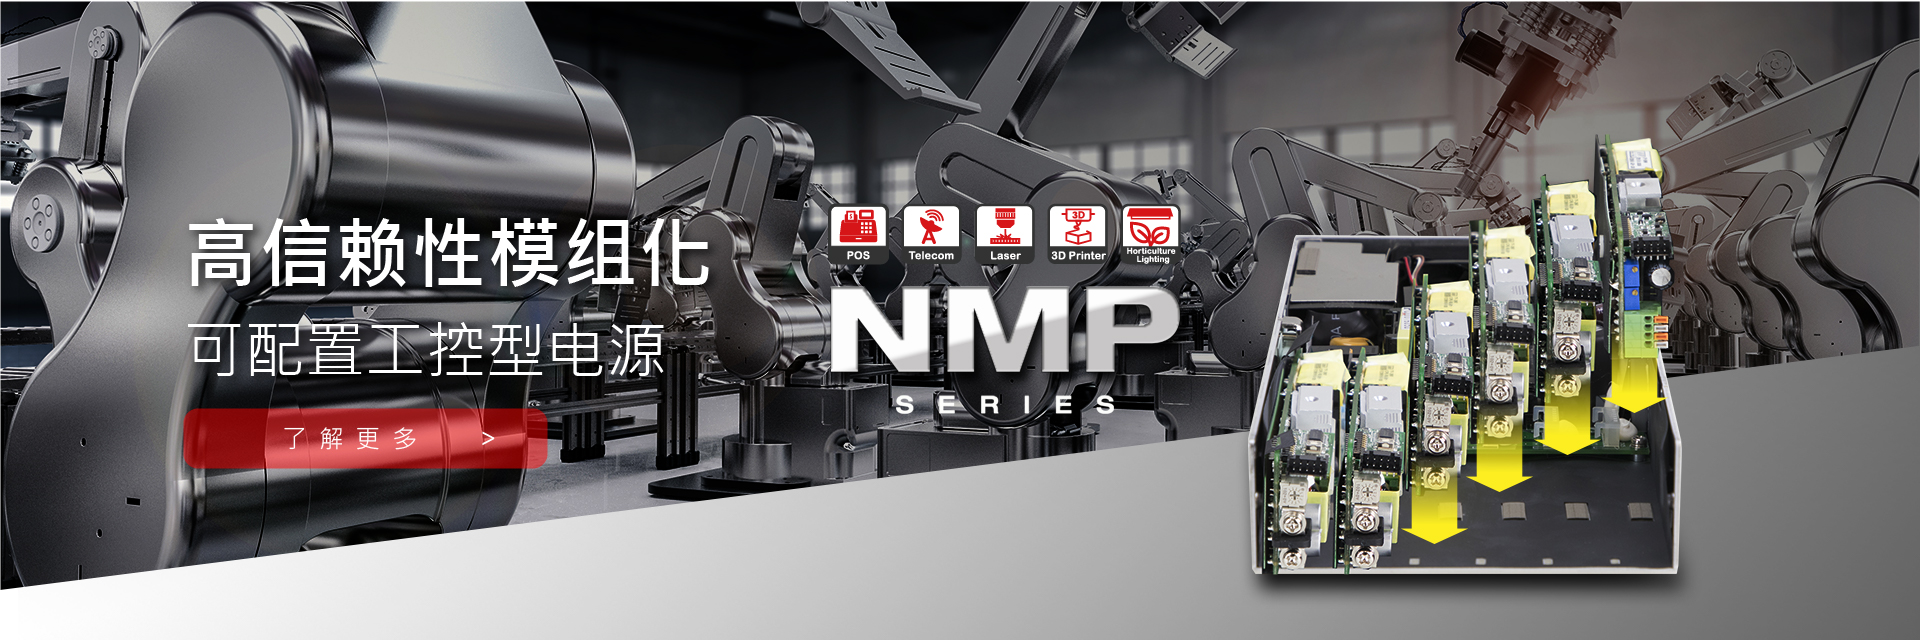 NMP-I-CN